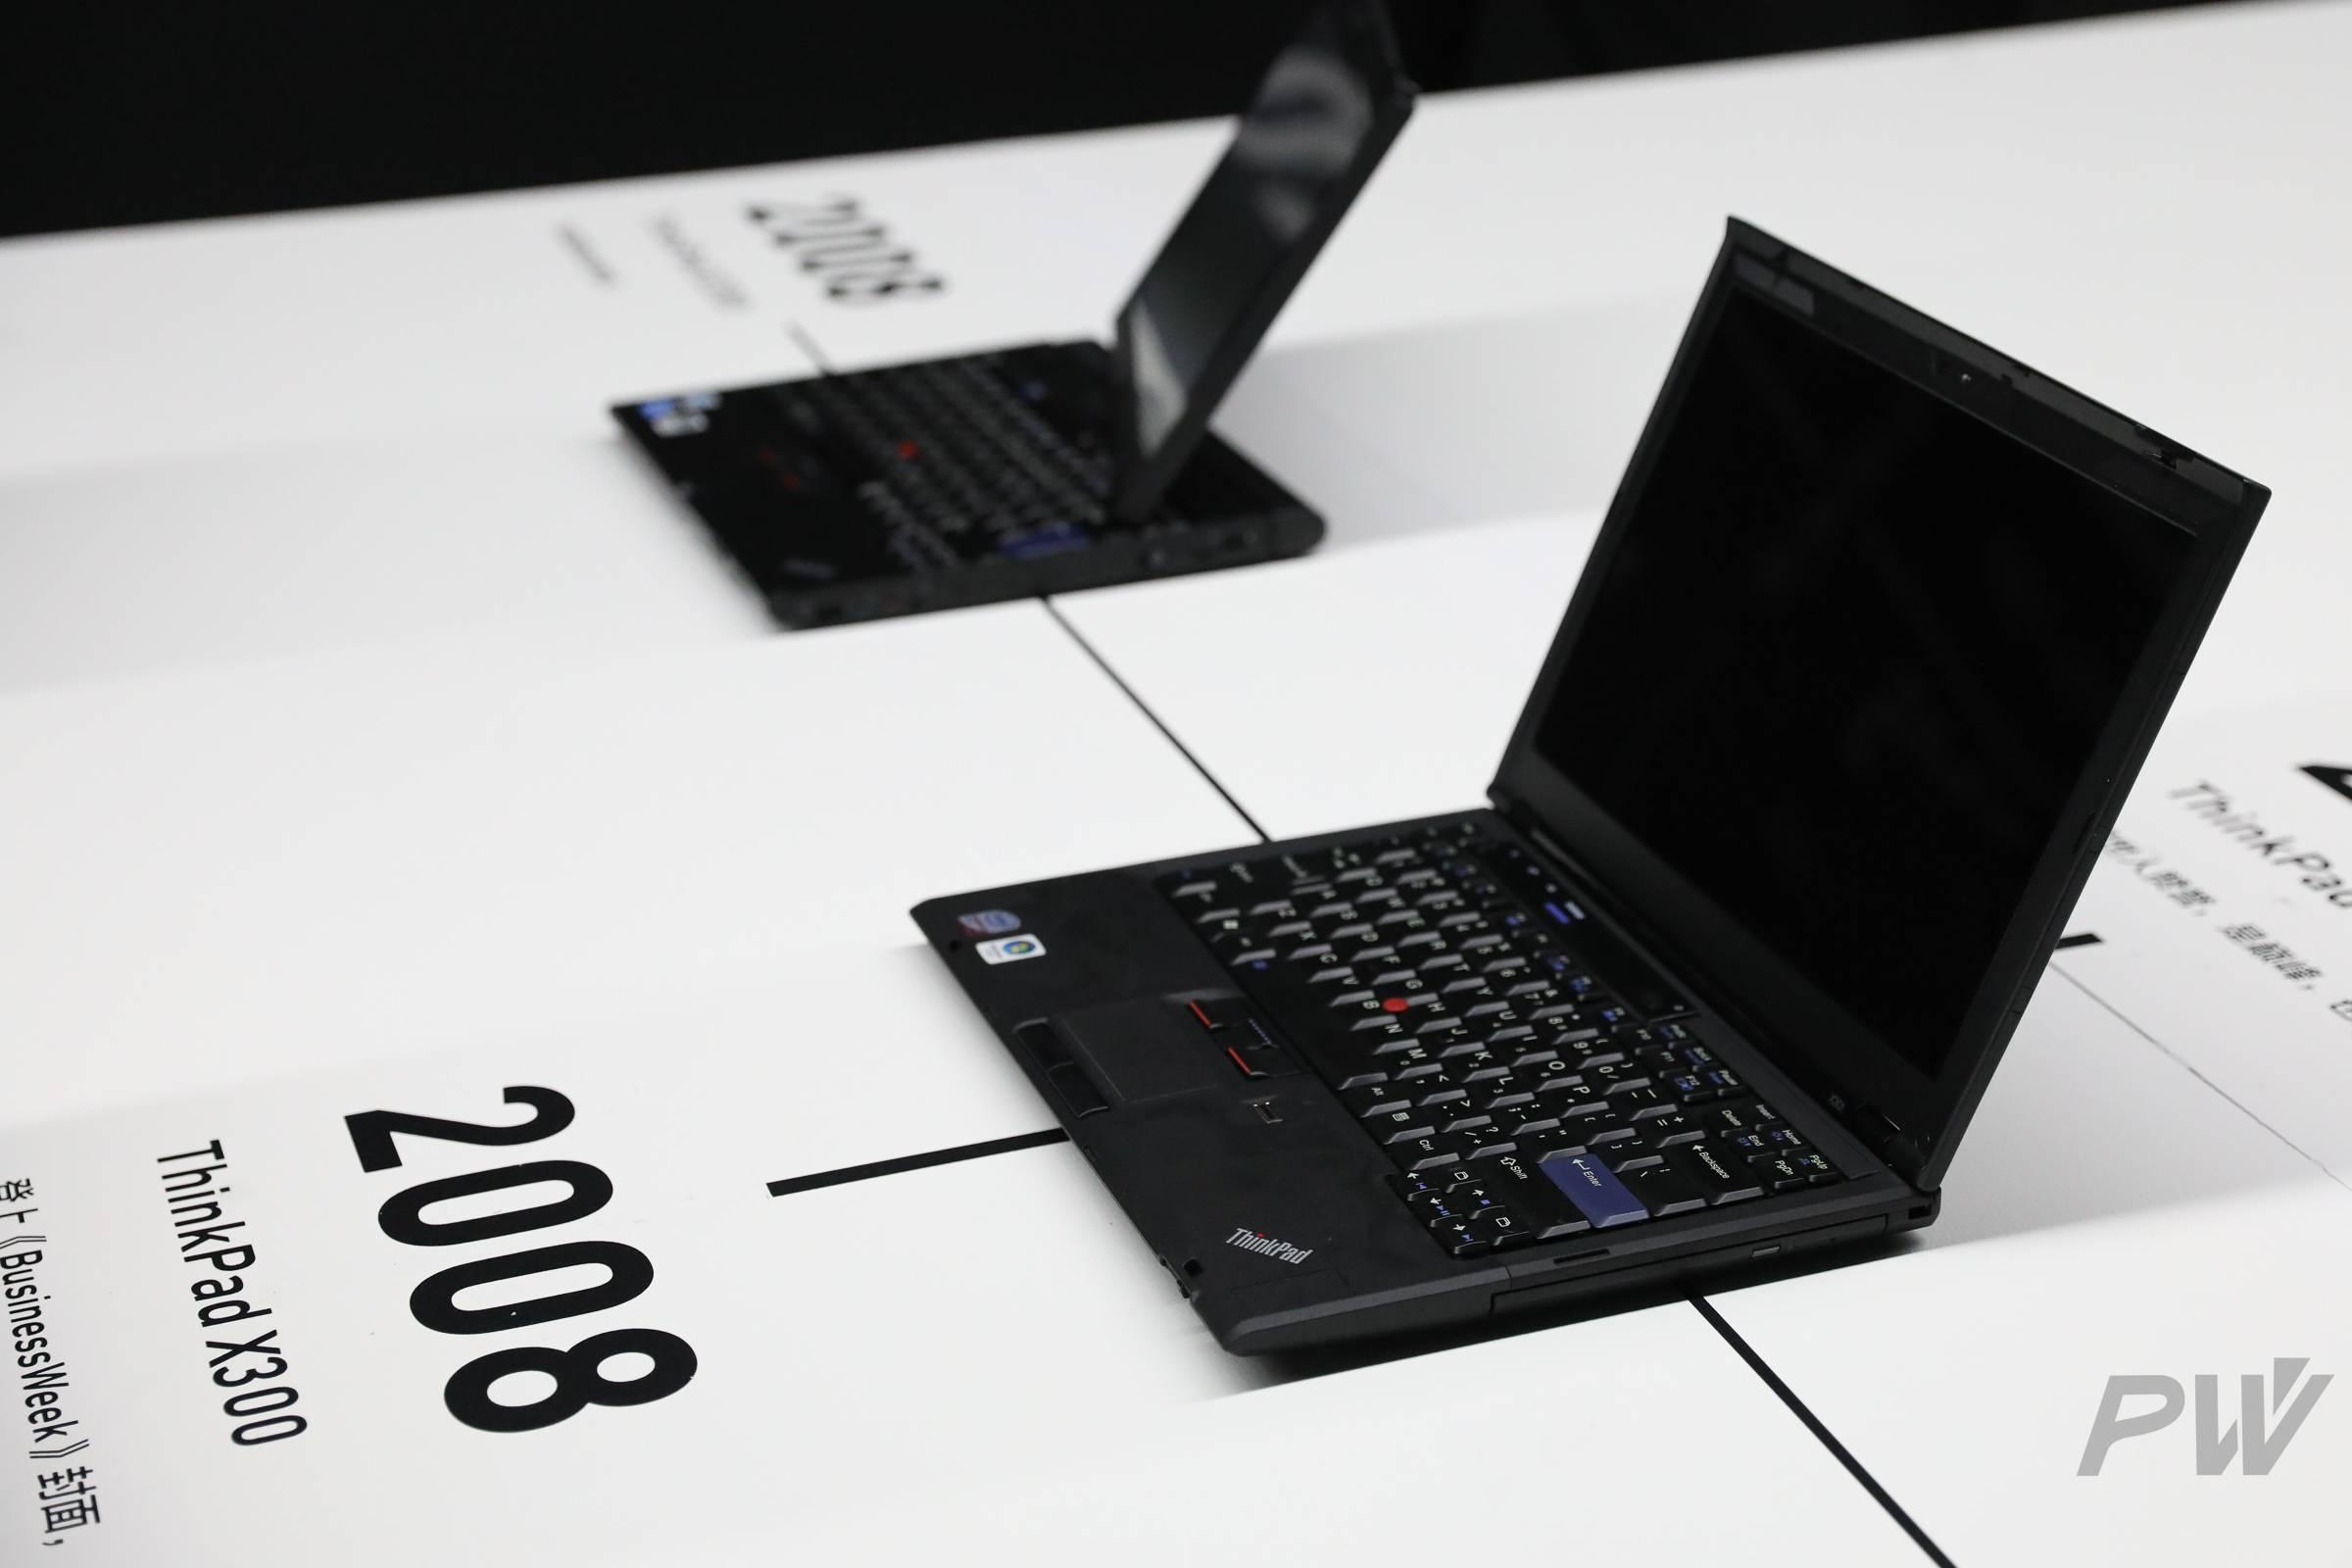 ThinkPad X300